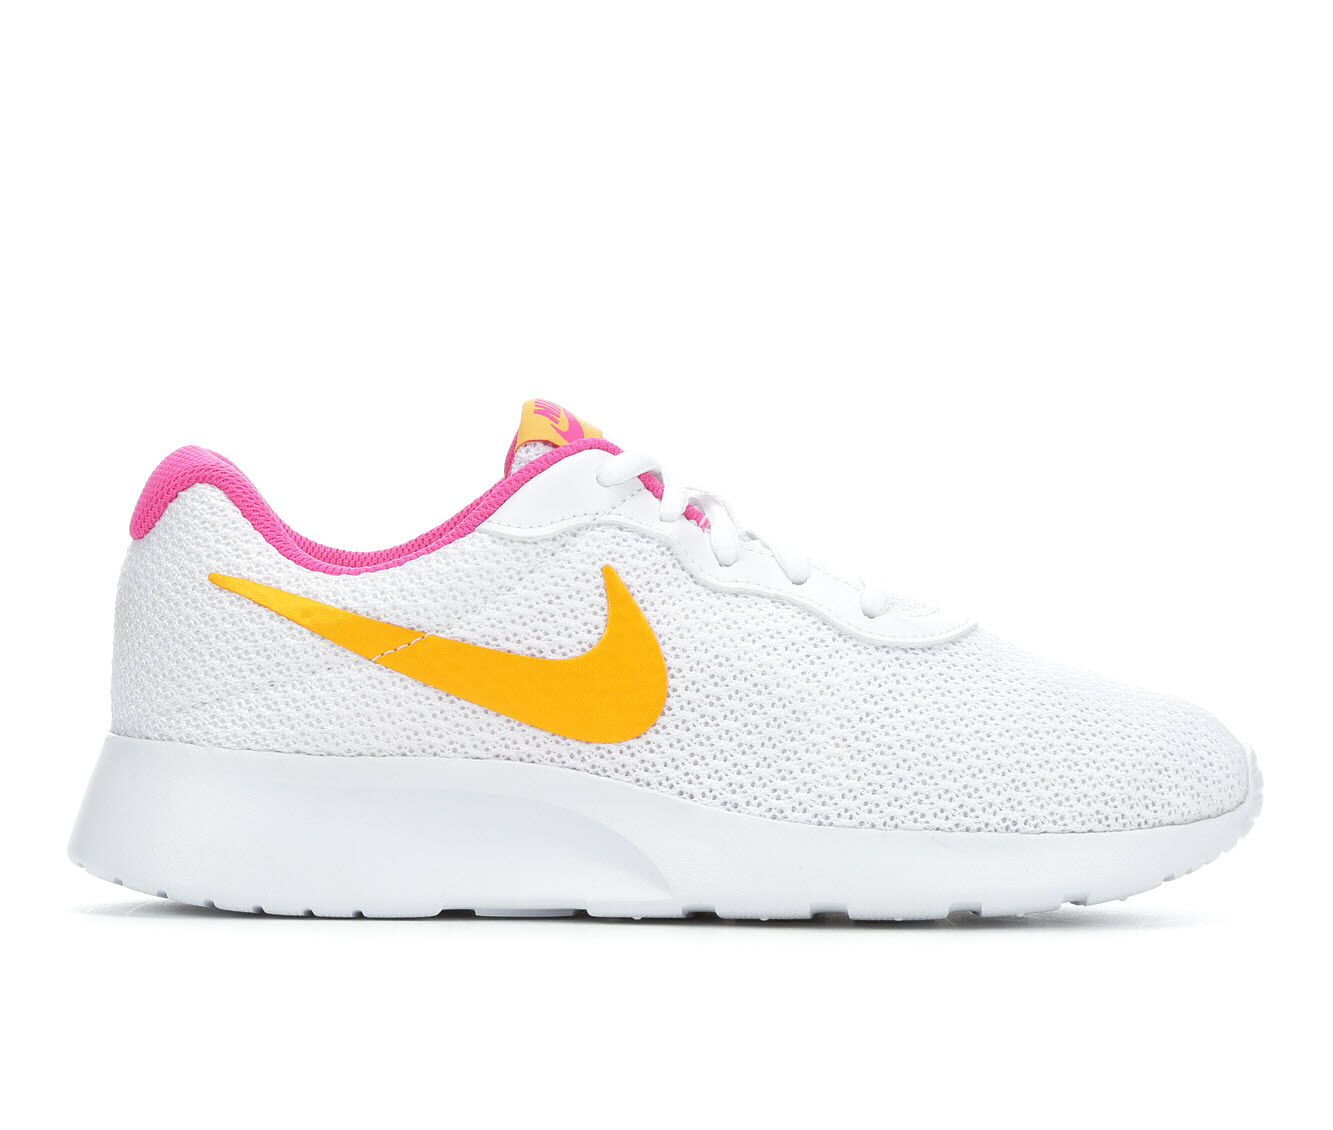 free shipping Women's Nike Tanjun Sneakers White/Gold/Pink